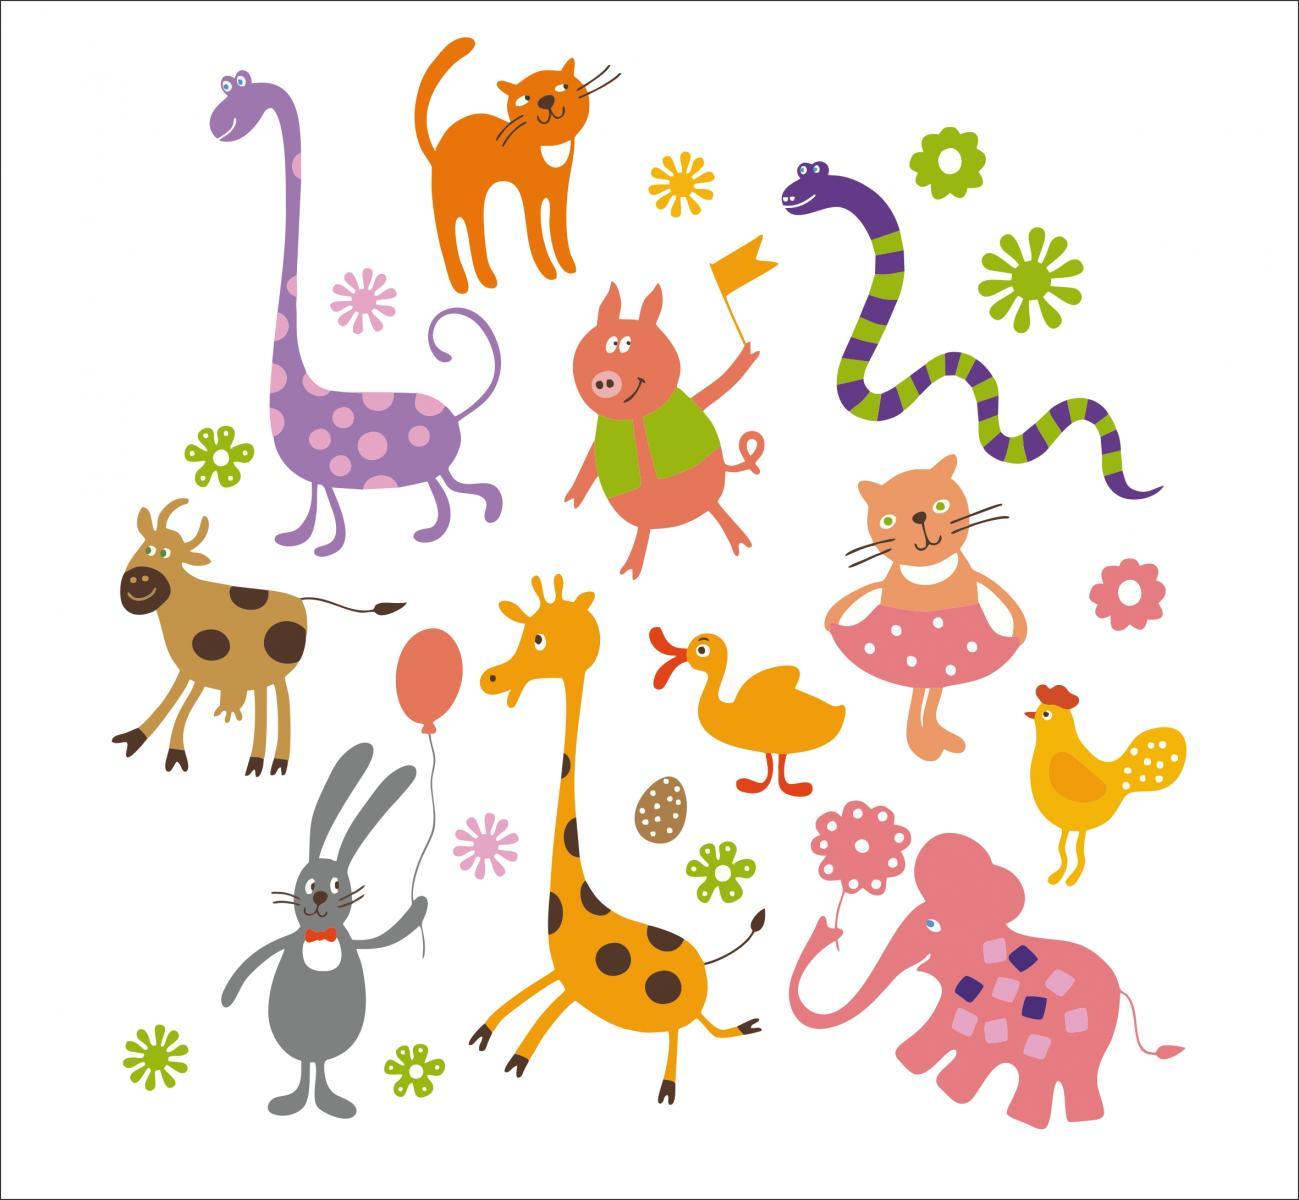 Childrens wallpaper pattern